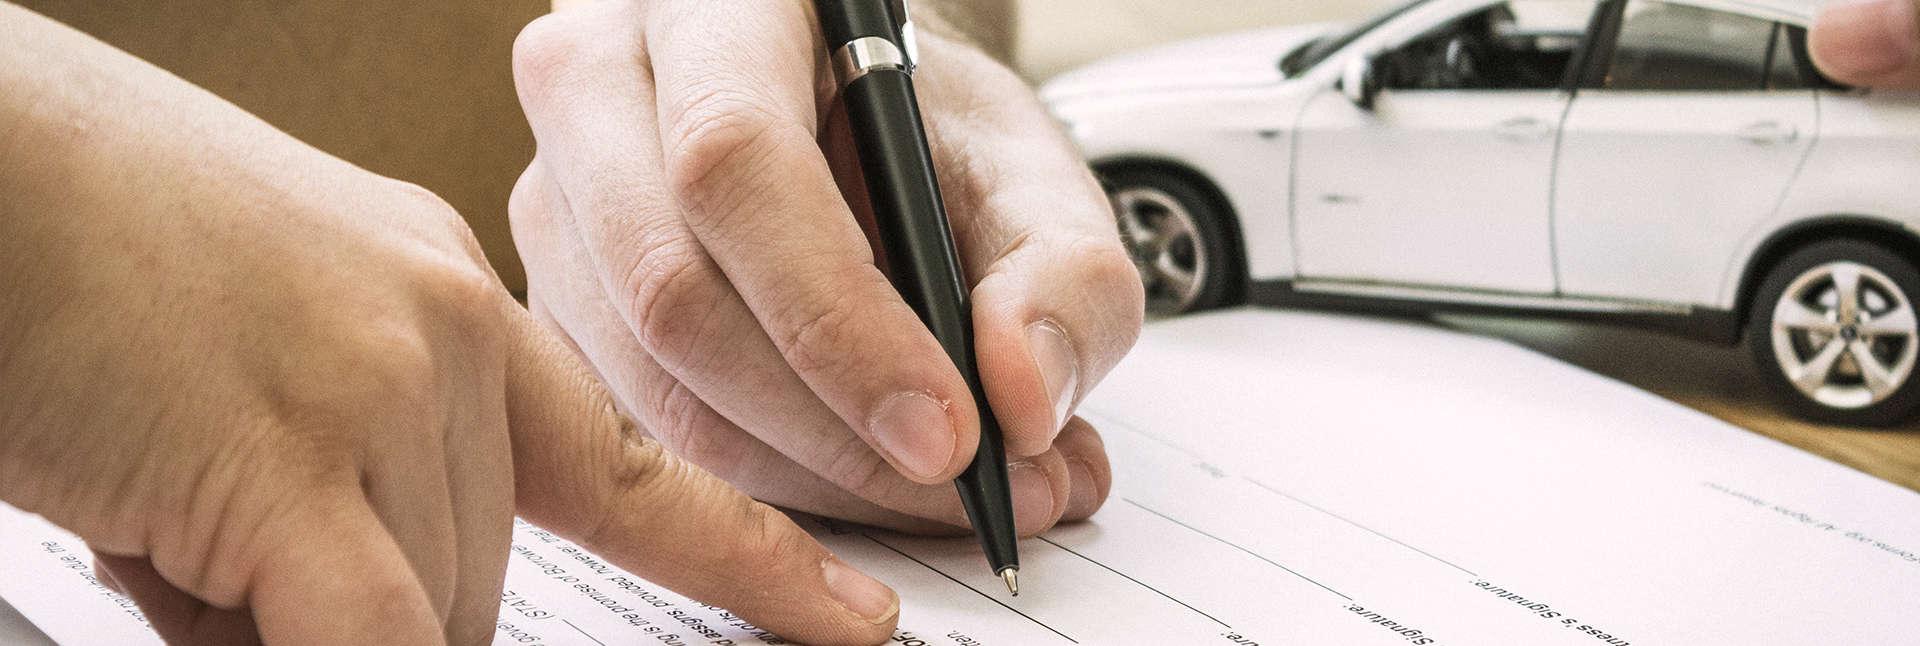 Starco insurance dmv car registration service